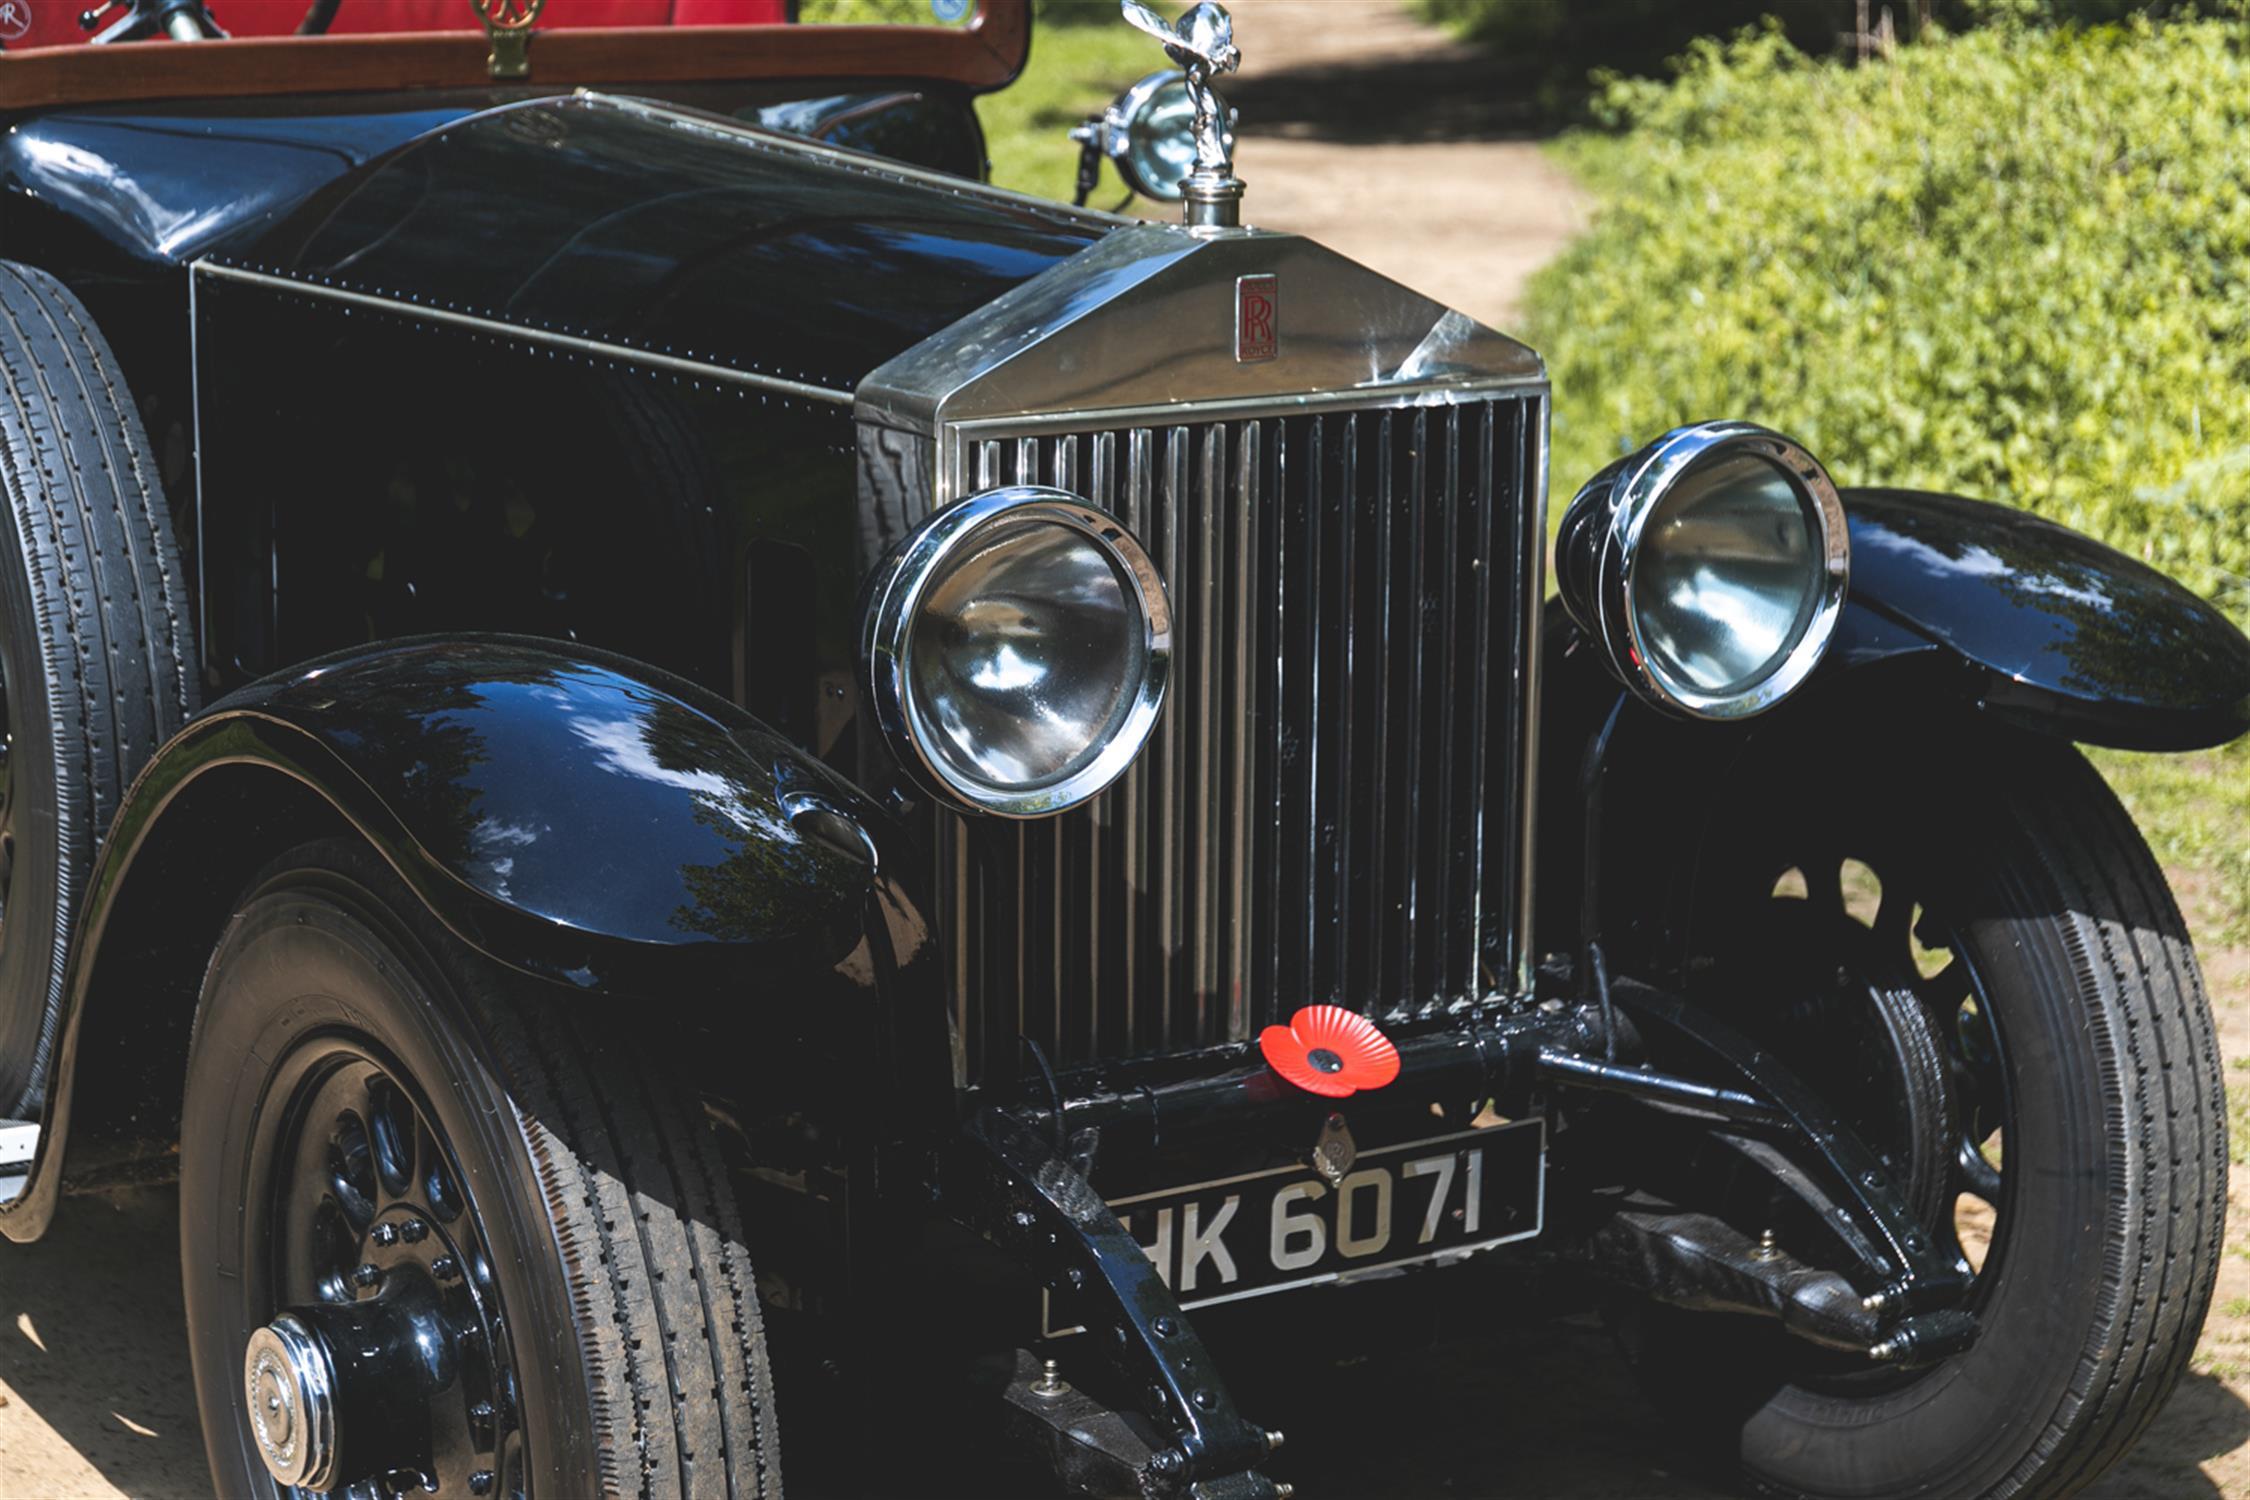 1927 Rolls-Royce Phantom 1 Open Tourer - Image 8 of 10